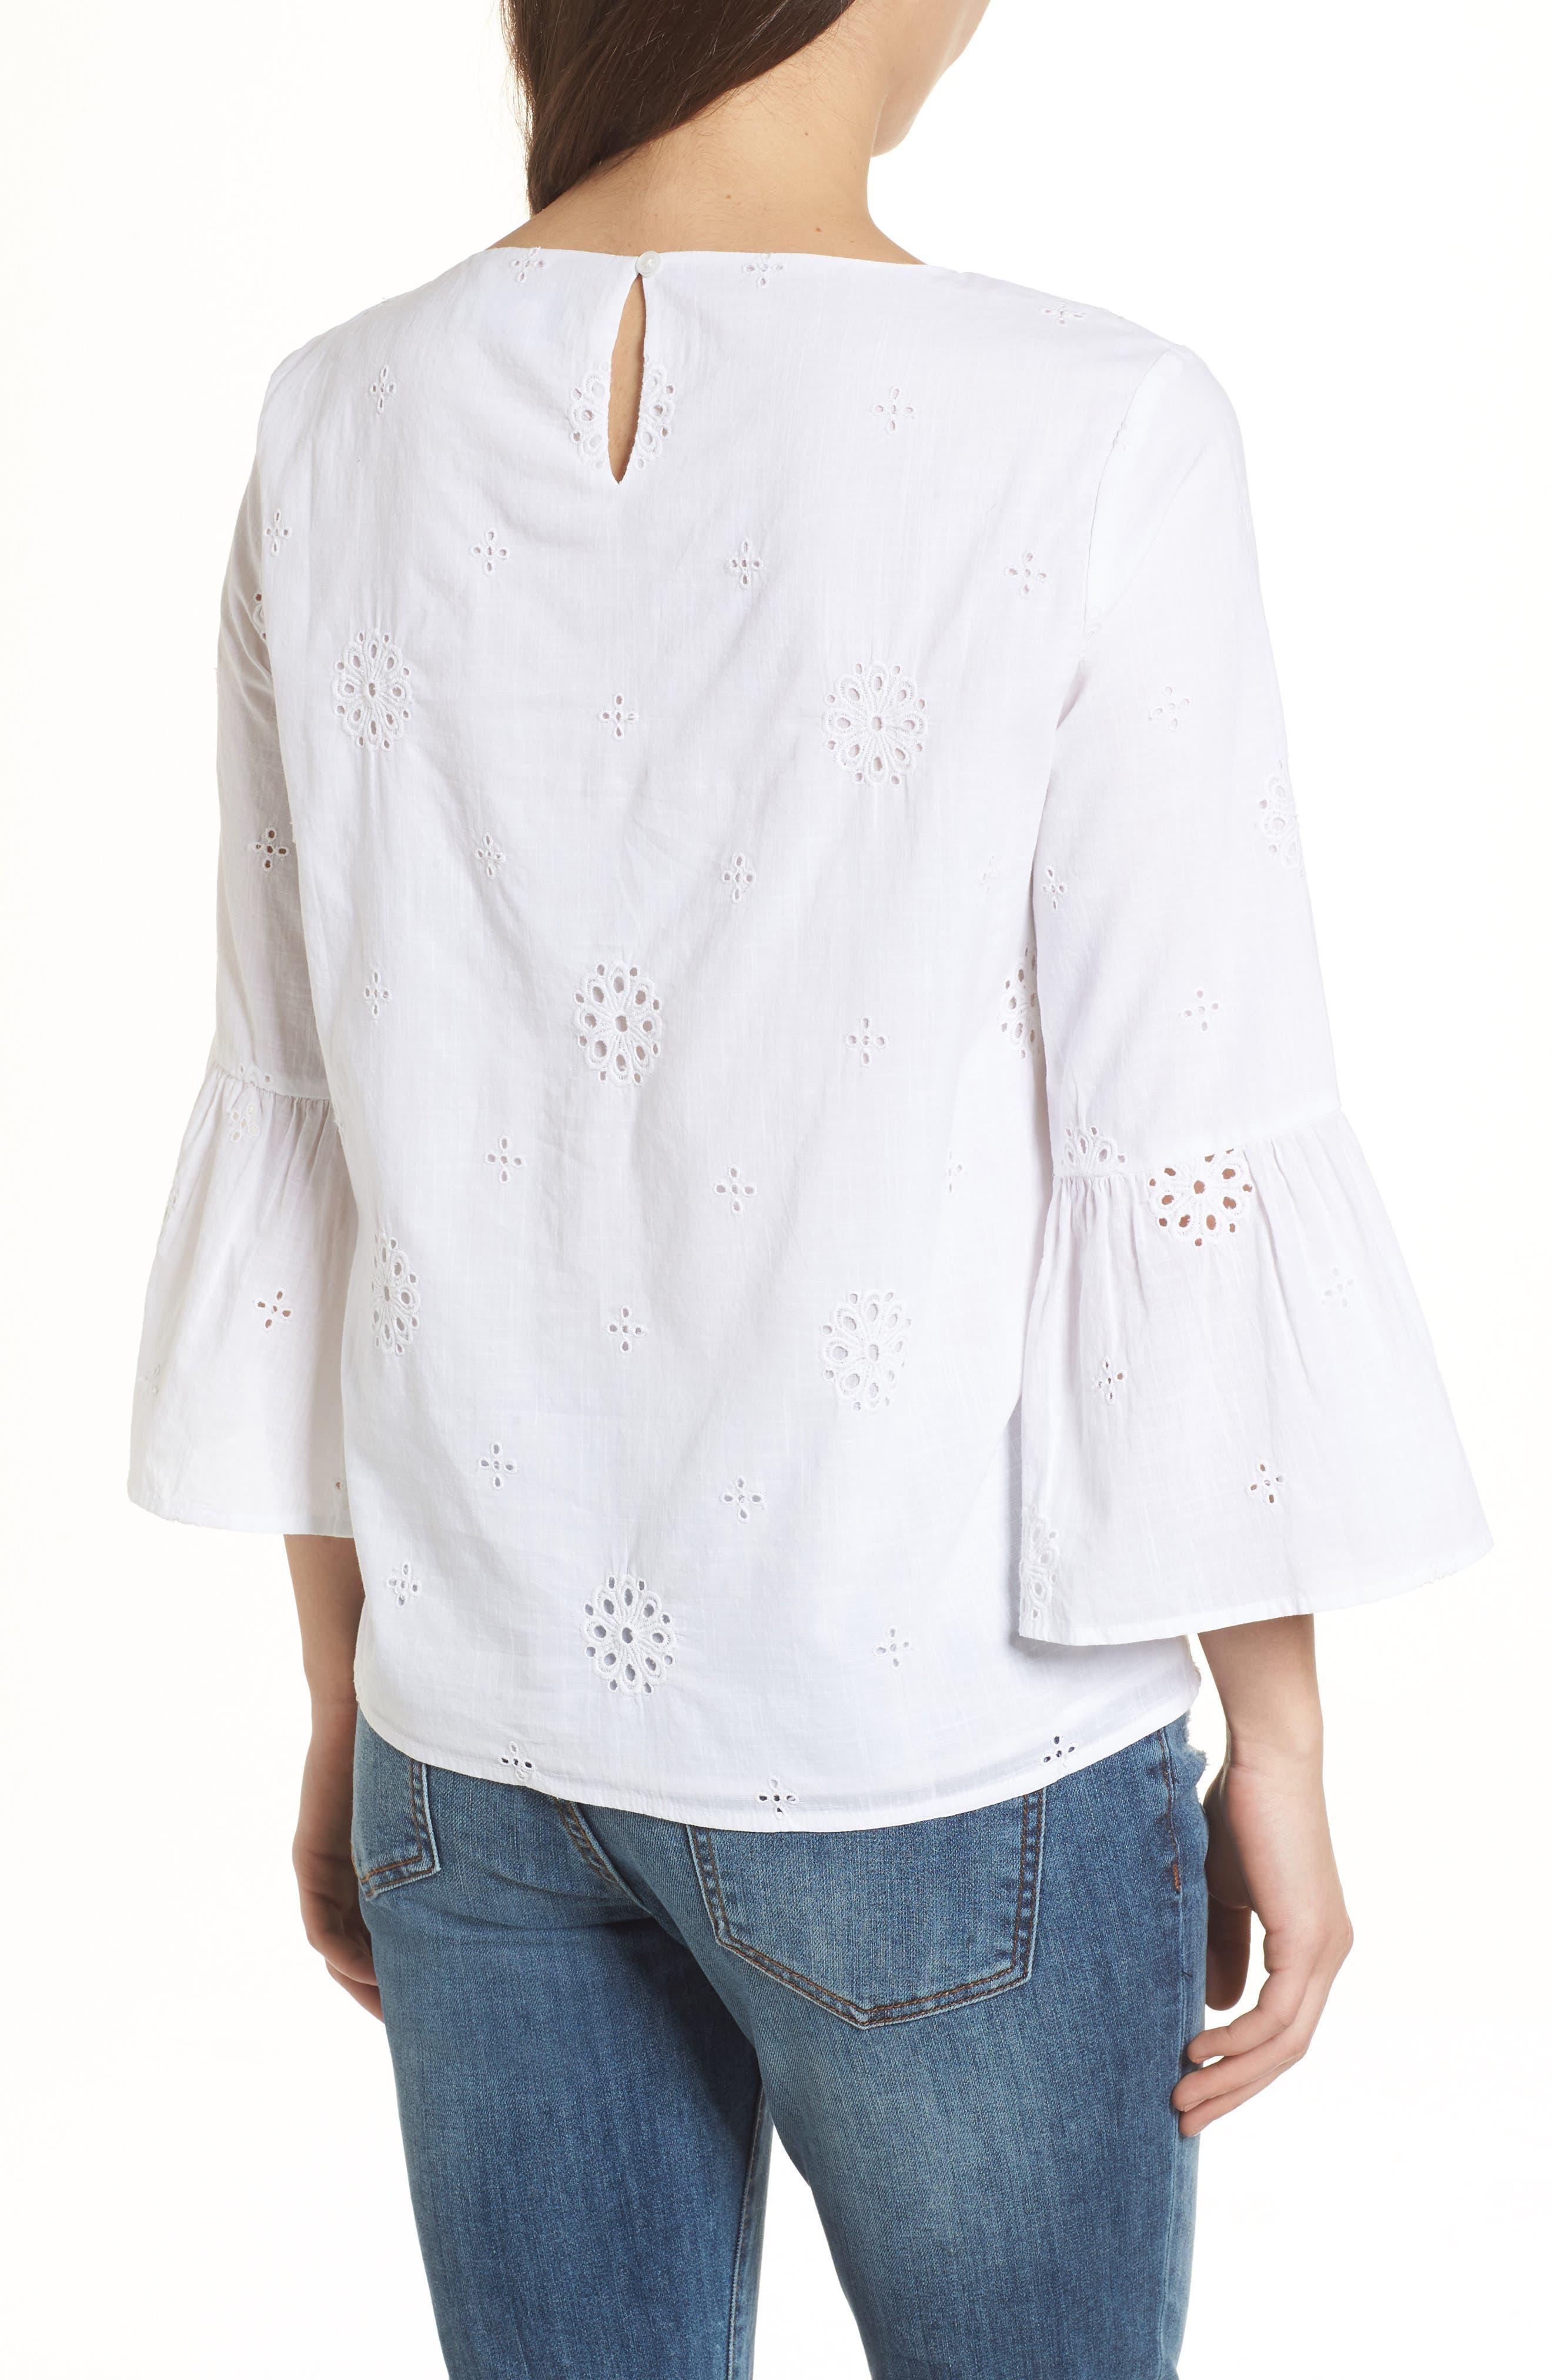 Eyelet Bell Sleeve Cotton Top,                             Alternate thumbnail 2, color,                             White Cap